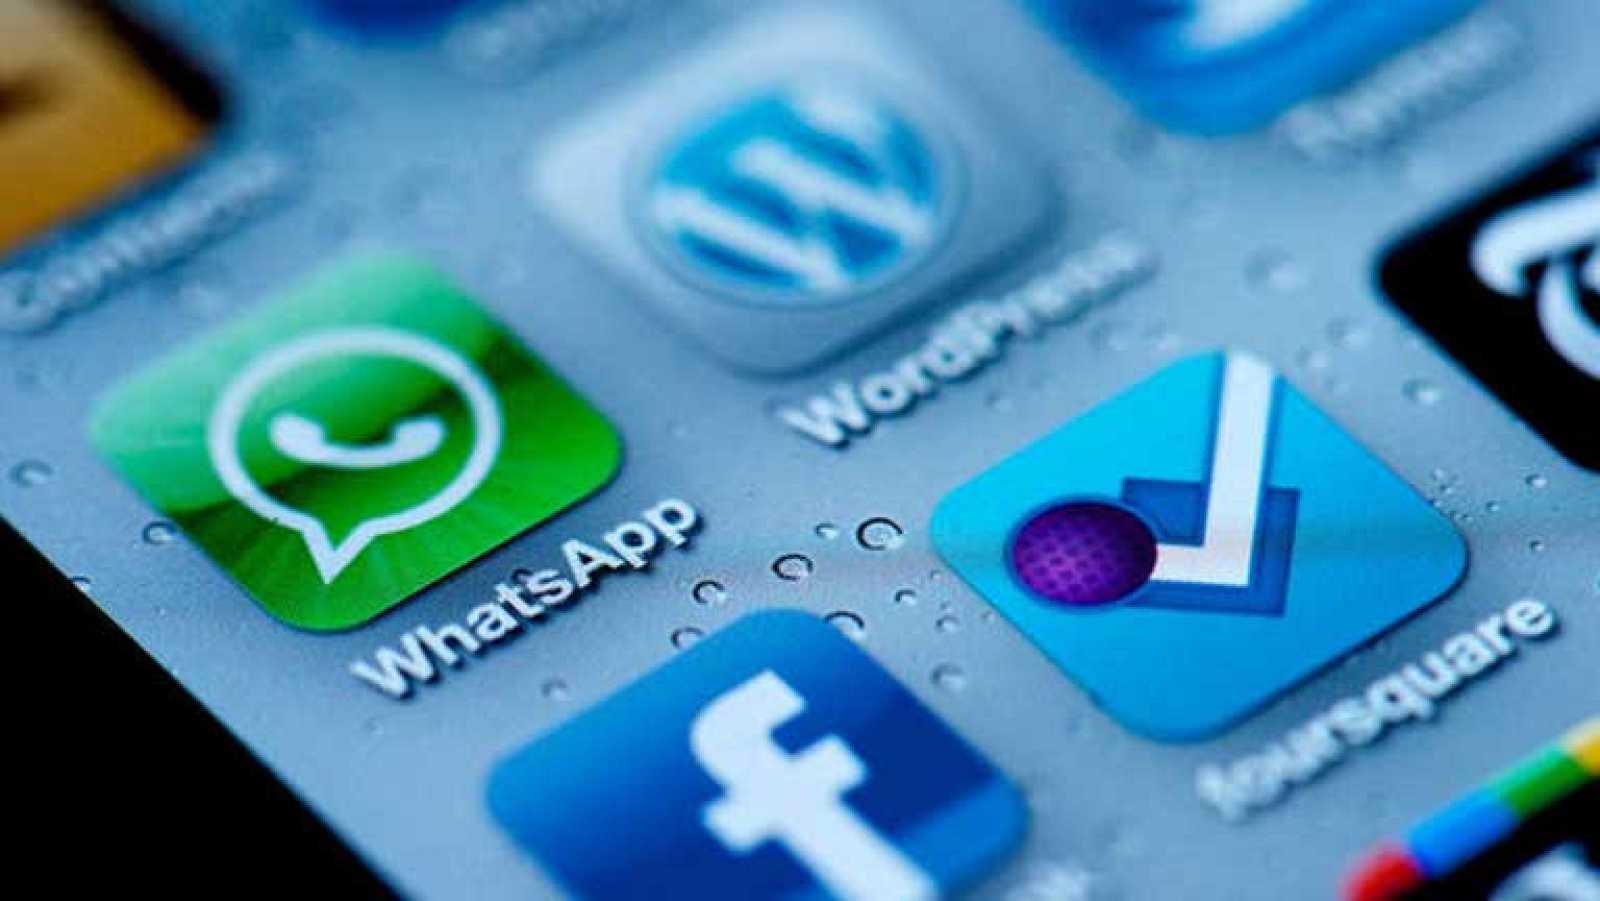 Whatsapp made in Spain